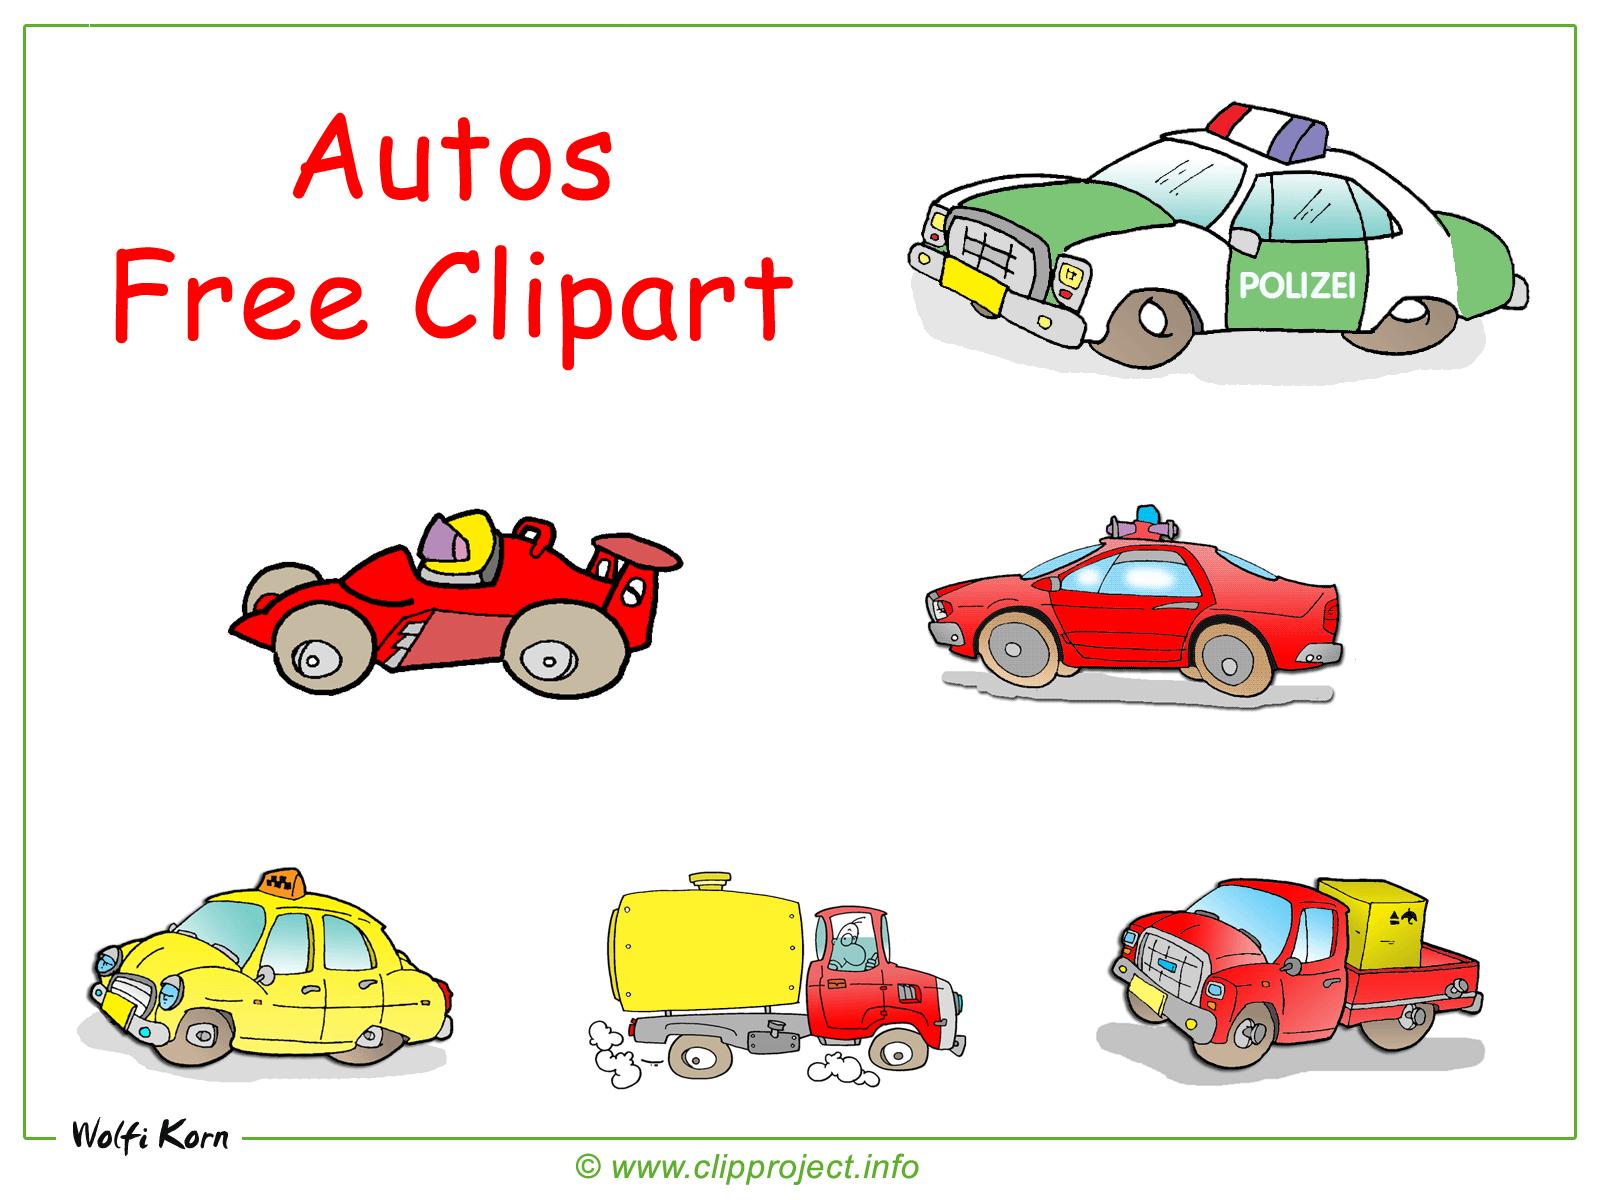 Autos clipart kostenlos svg black and white download Cliparts autos gratis - ClipartFest svg black and white download